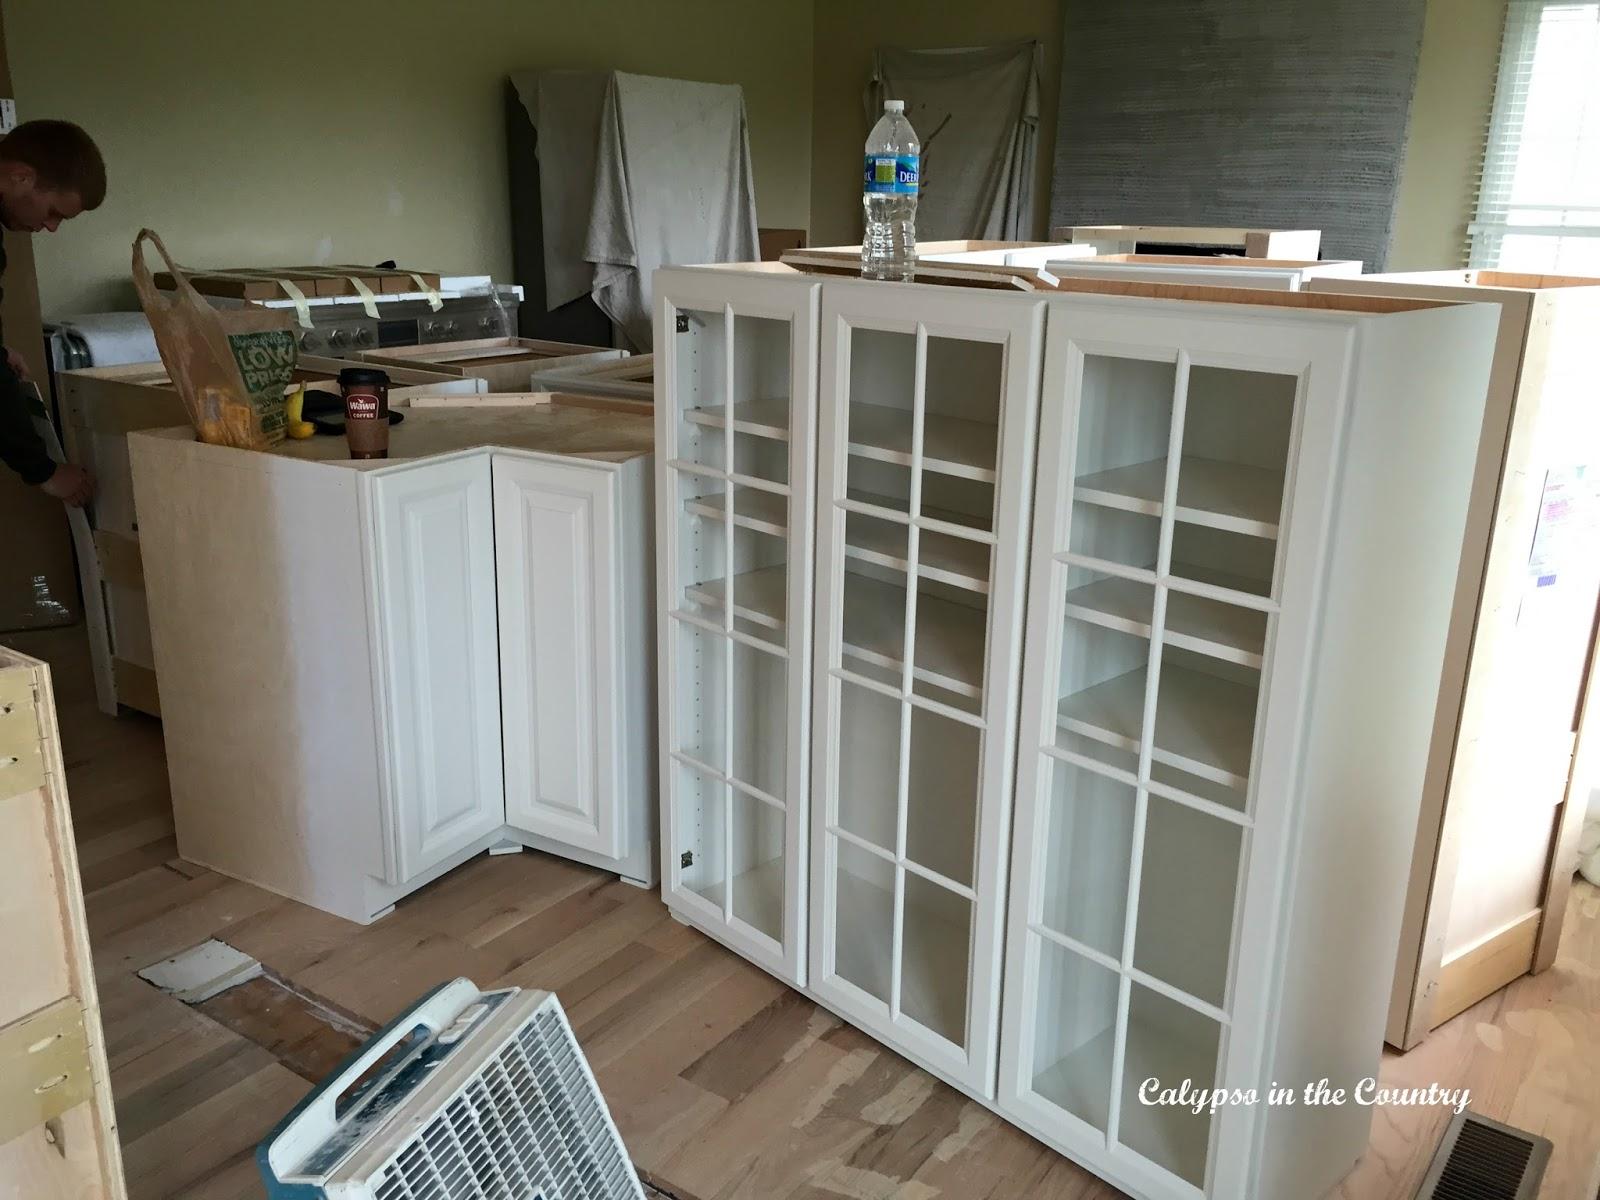 Renovation Progress - kitchen cabinets